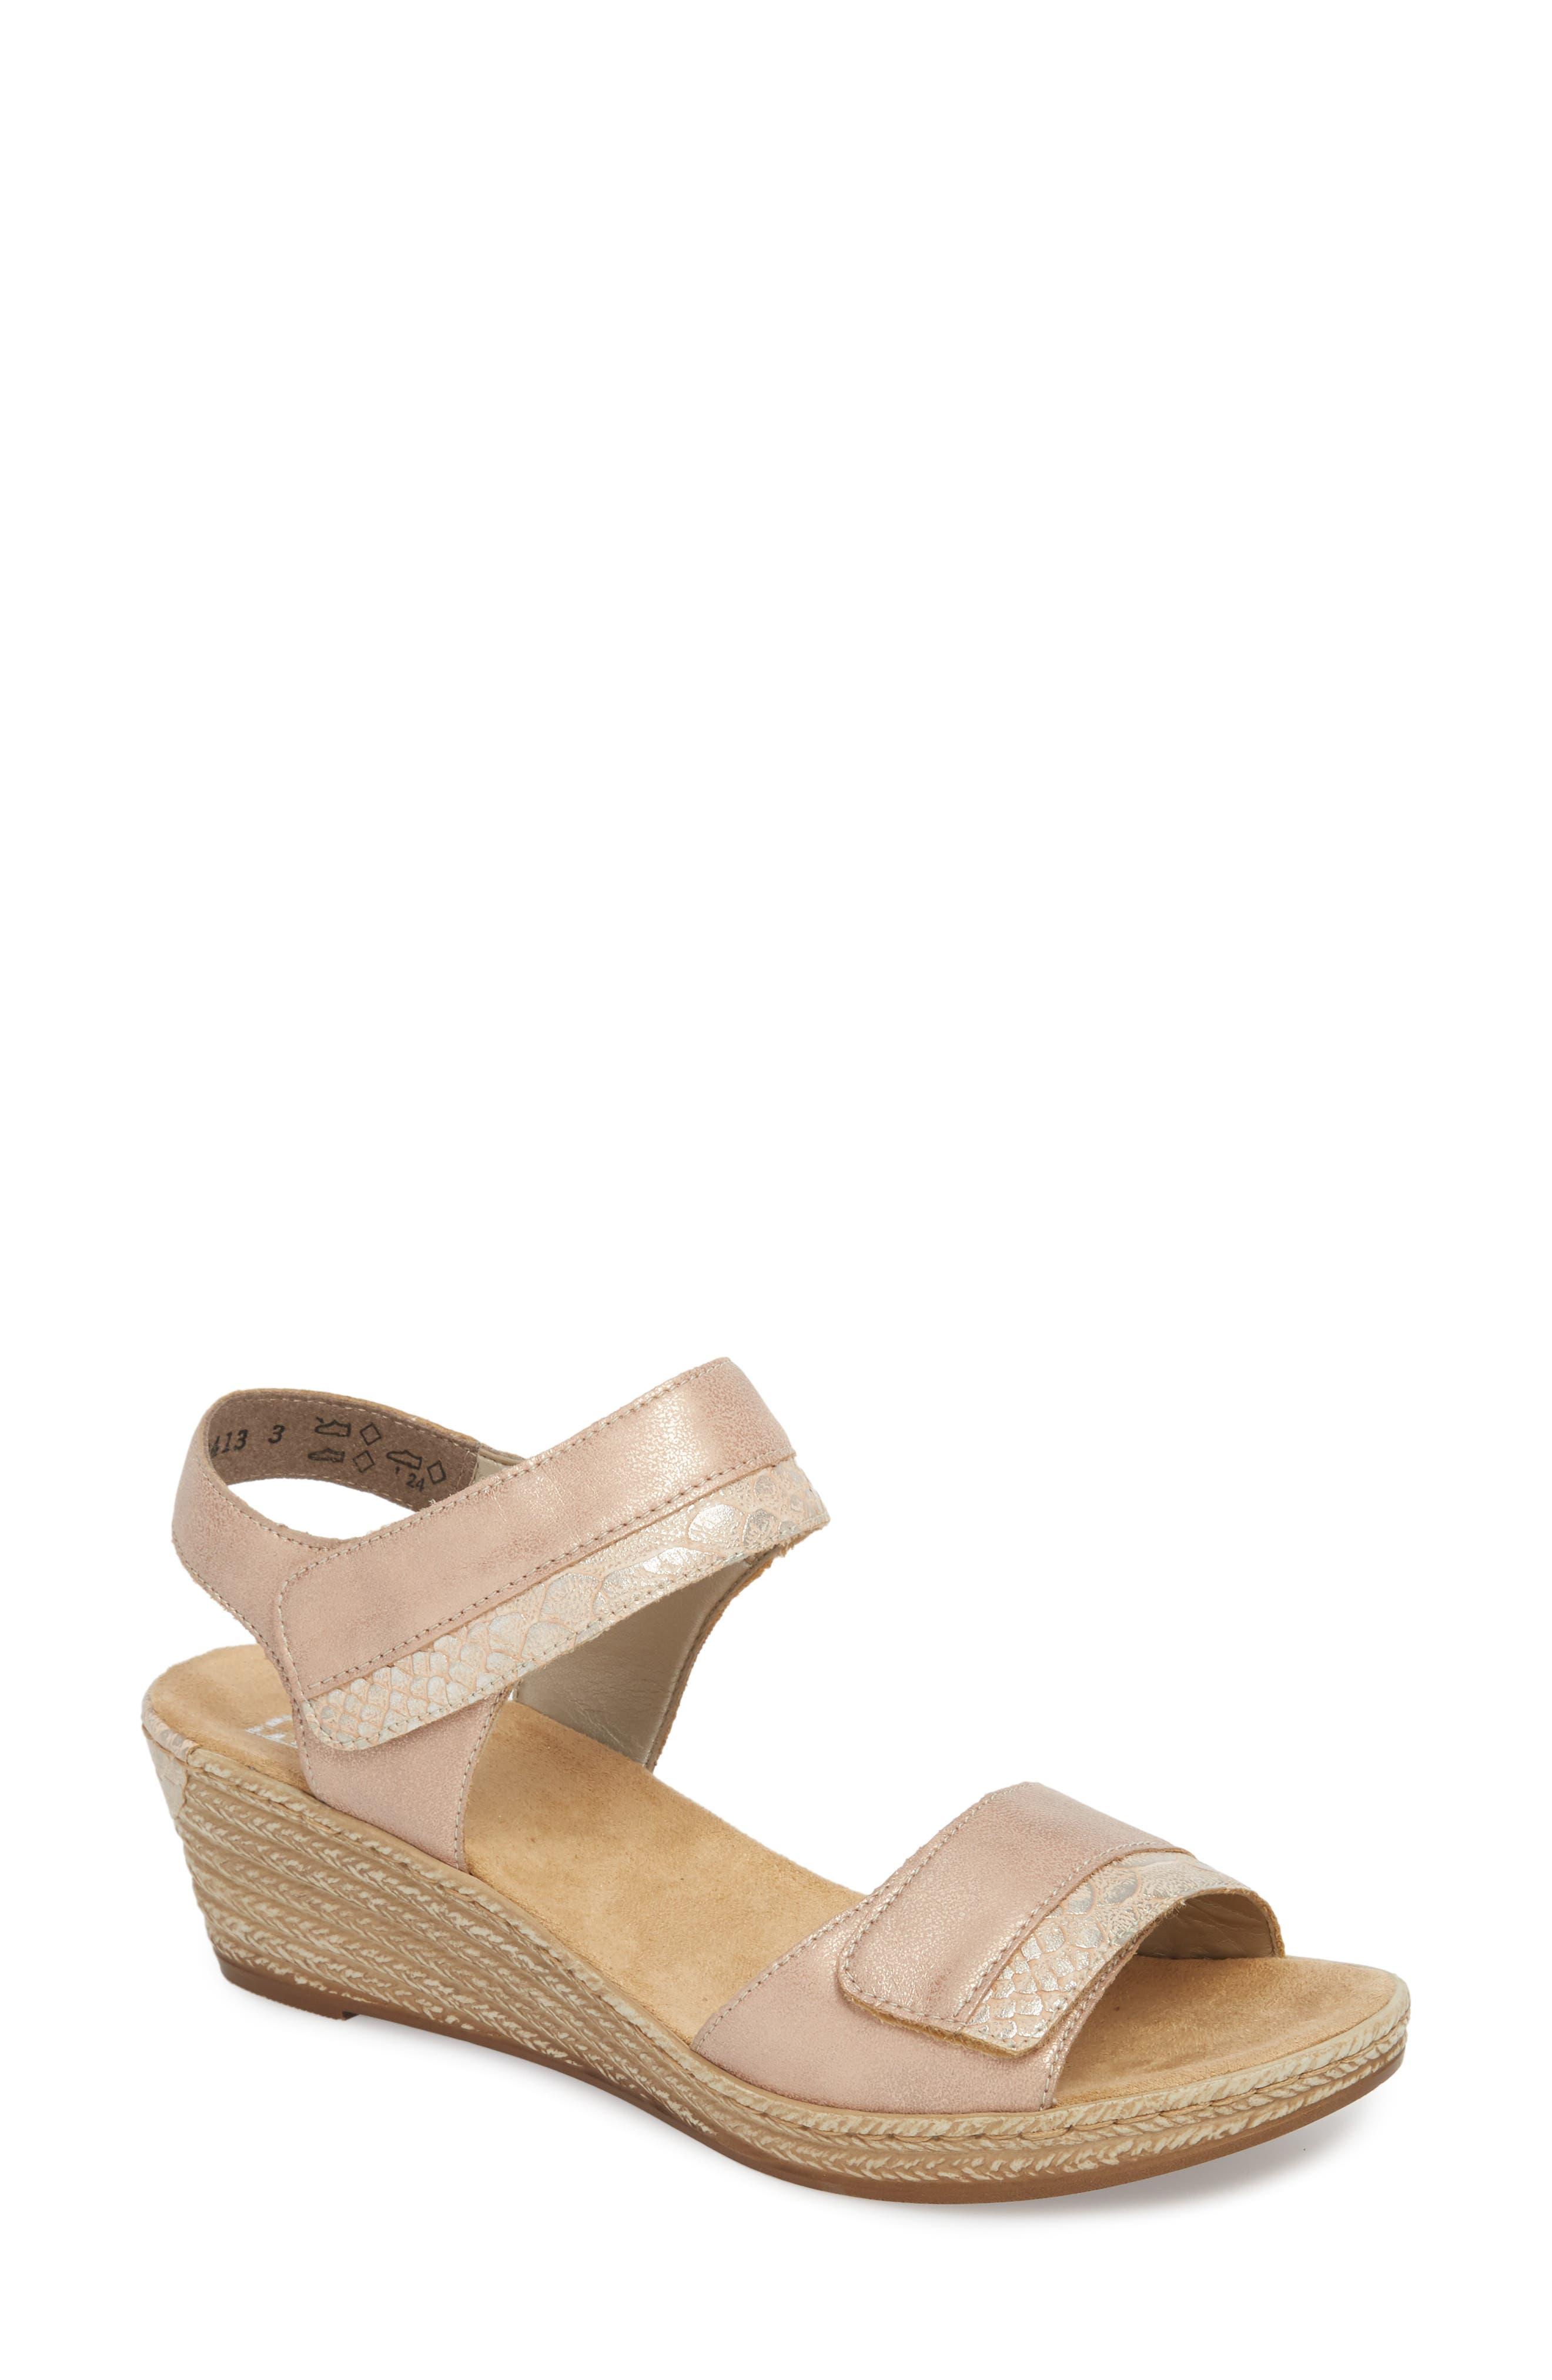 RIEKER ANTISTRESS Fanni 70 Wedge Sandal, Main, color, ROSE/ GINGER